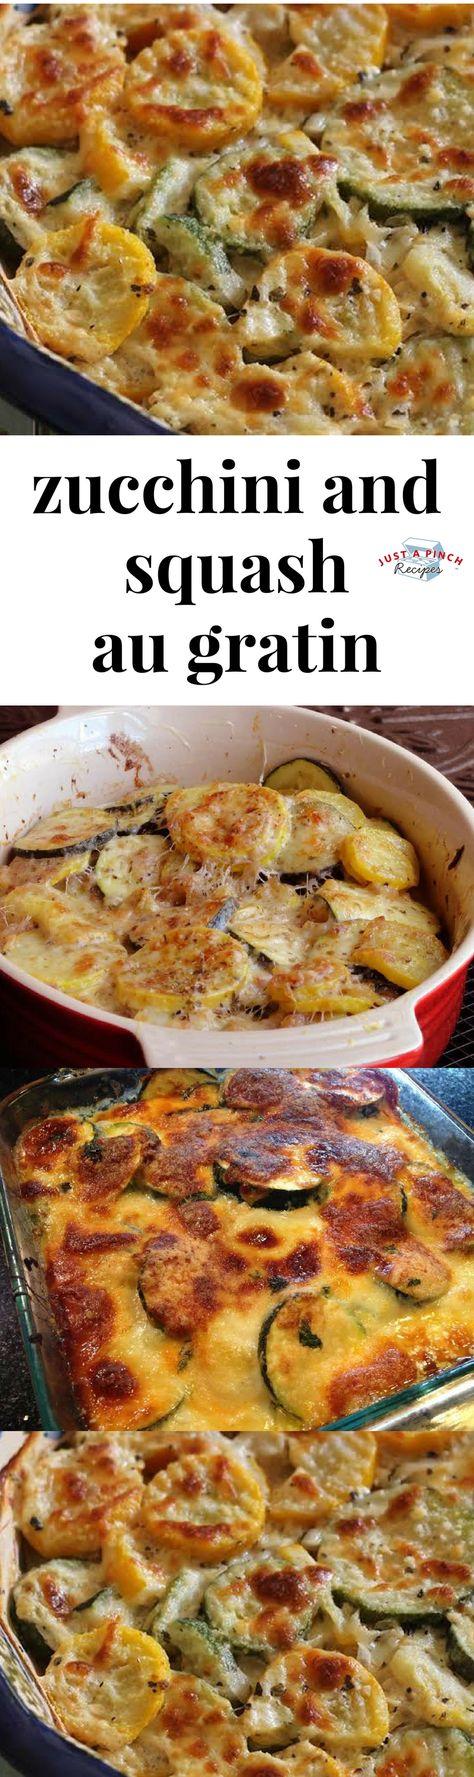 Zucchini and squash au gratin recipe is an easy summer side dish! #summerrecipe #summerdinner #sidedish #summersidedish #zucchini #squash